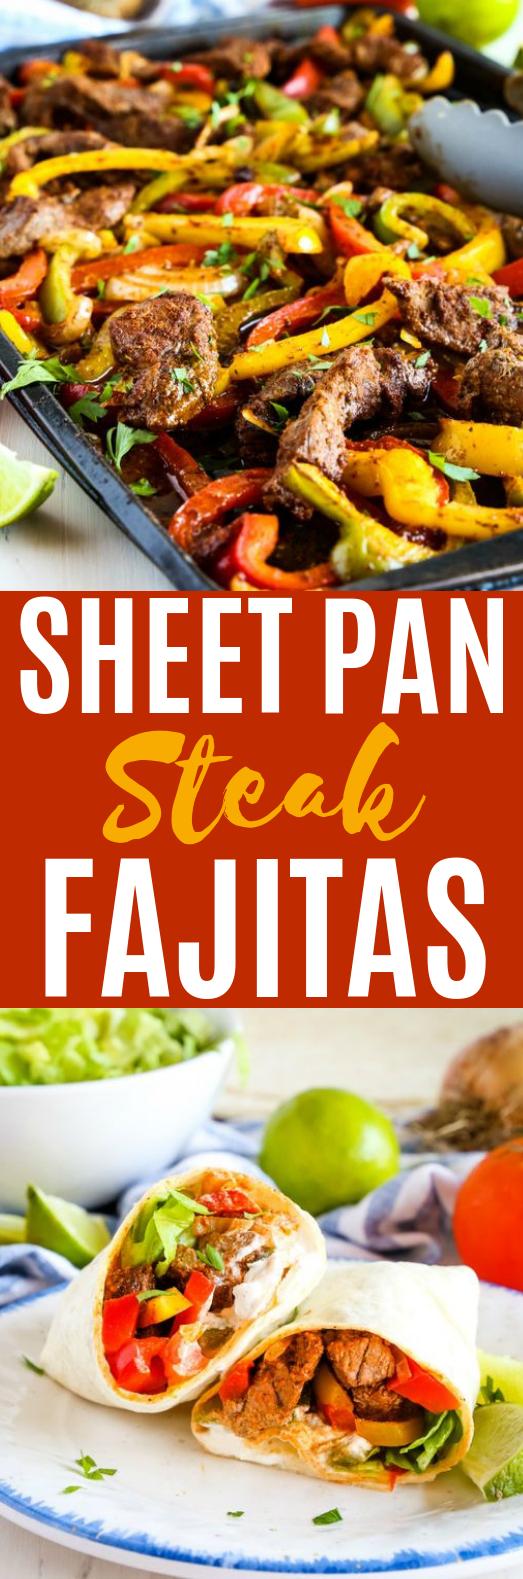 Easy Sheet Pan Steak Fajitas #dinner #steak